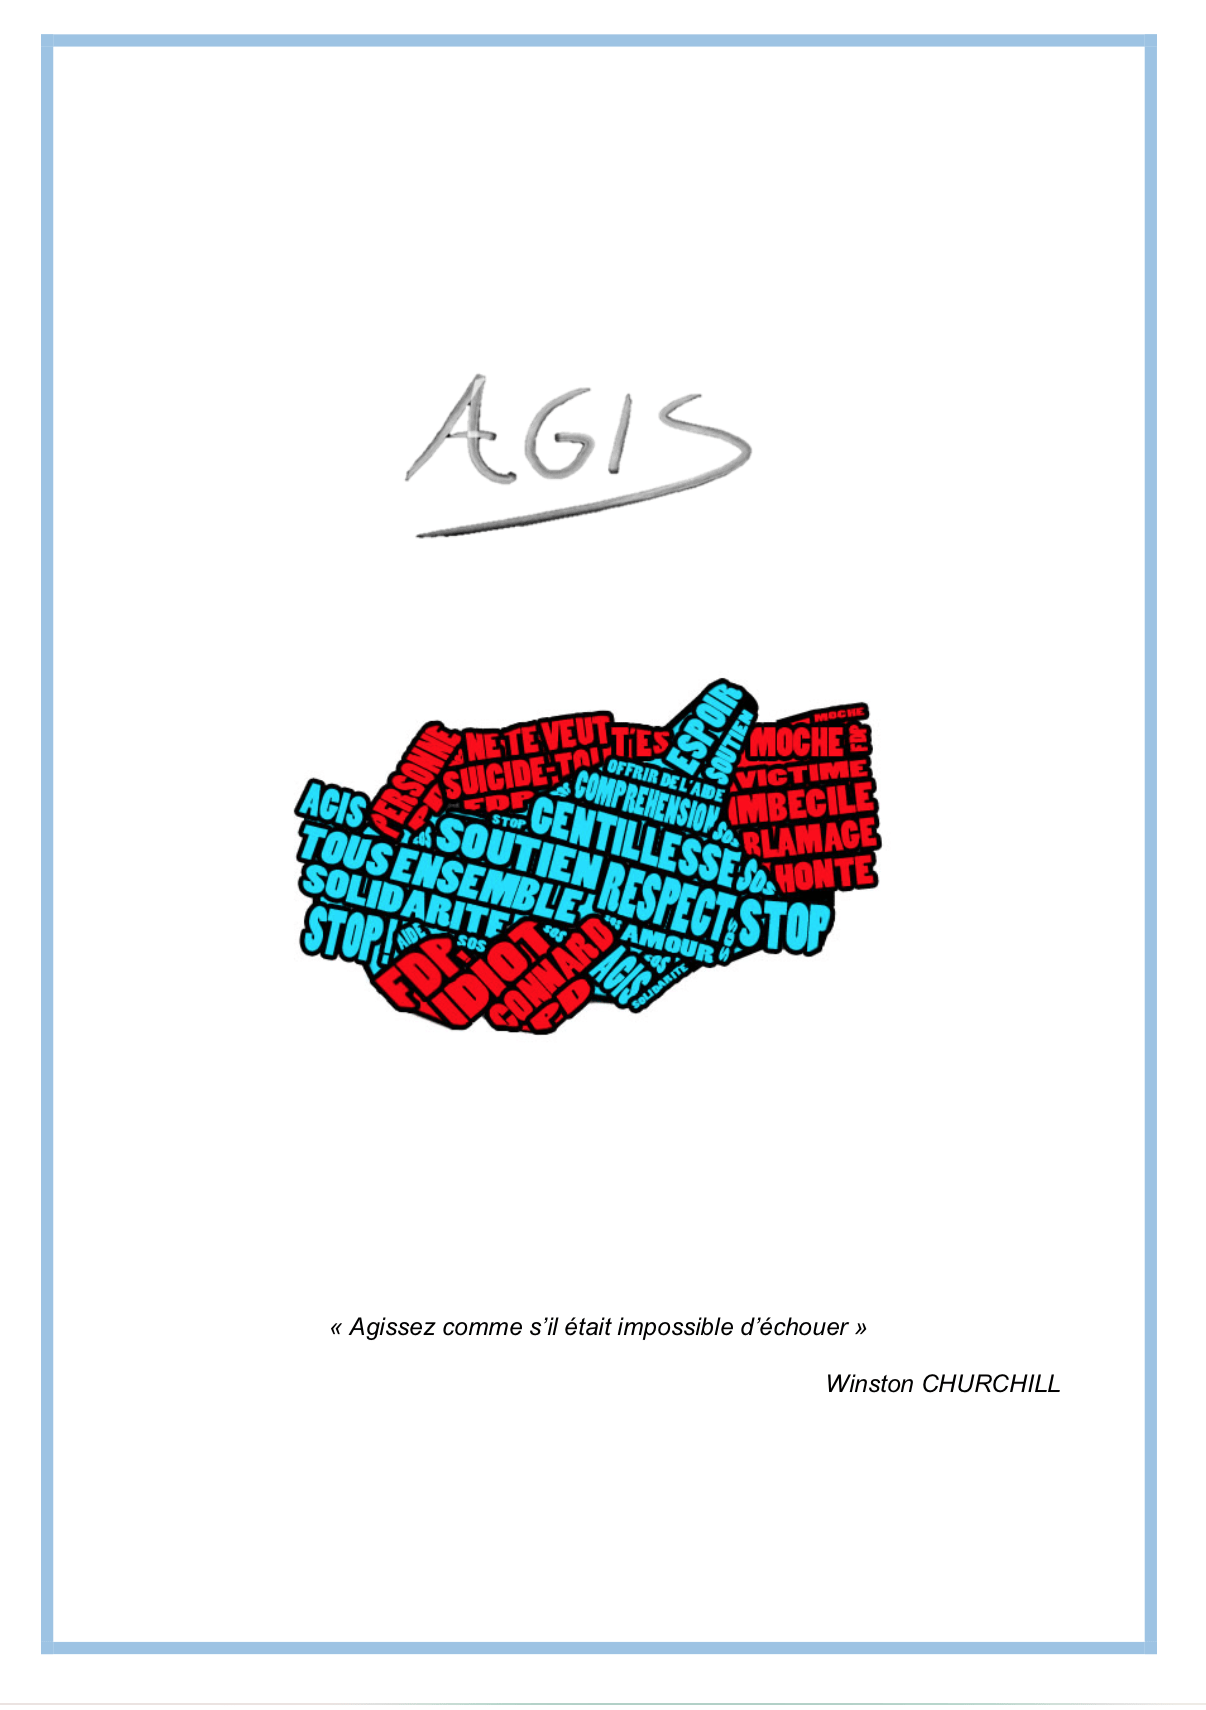 AGIS HOME